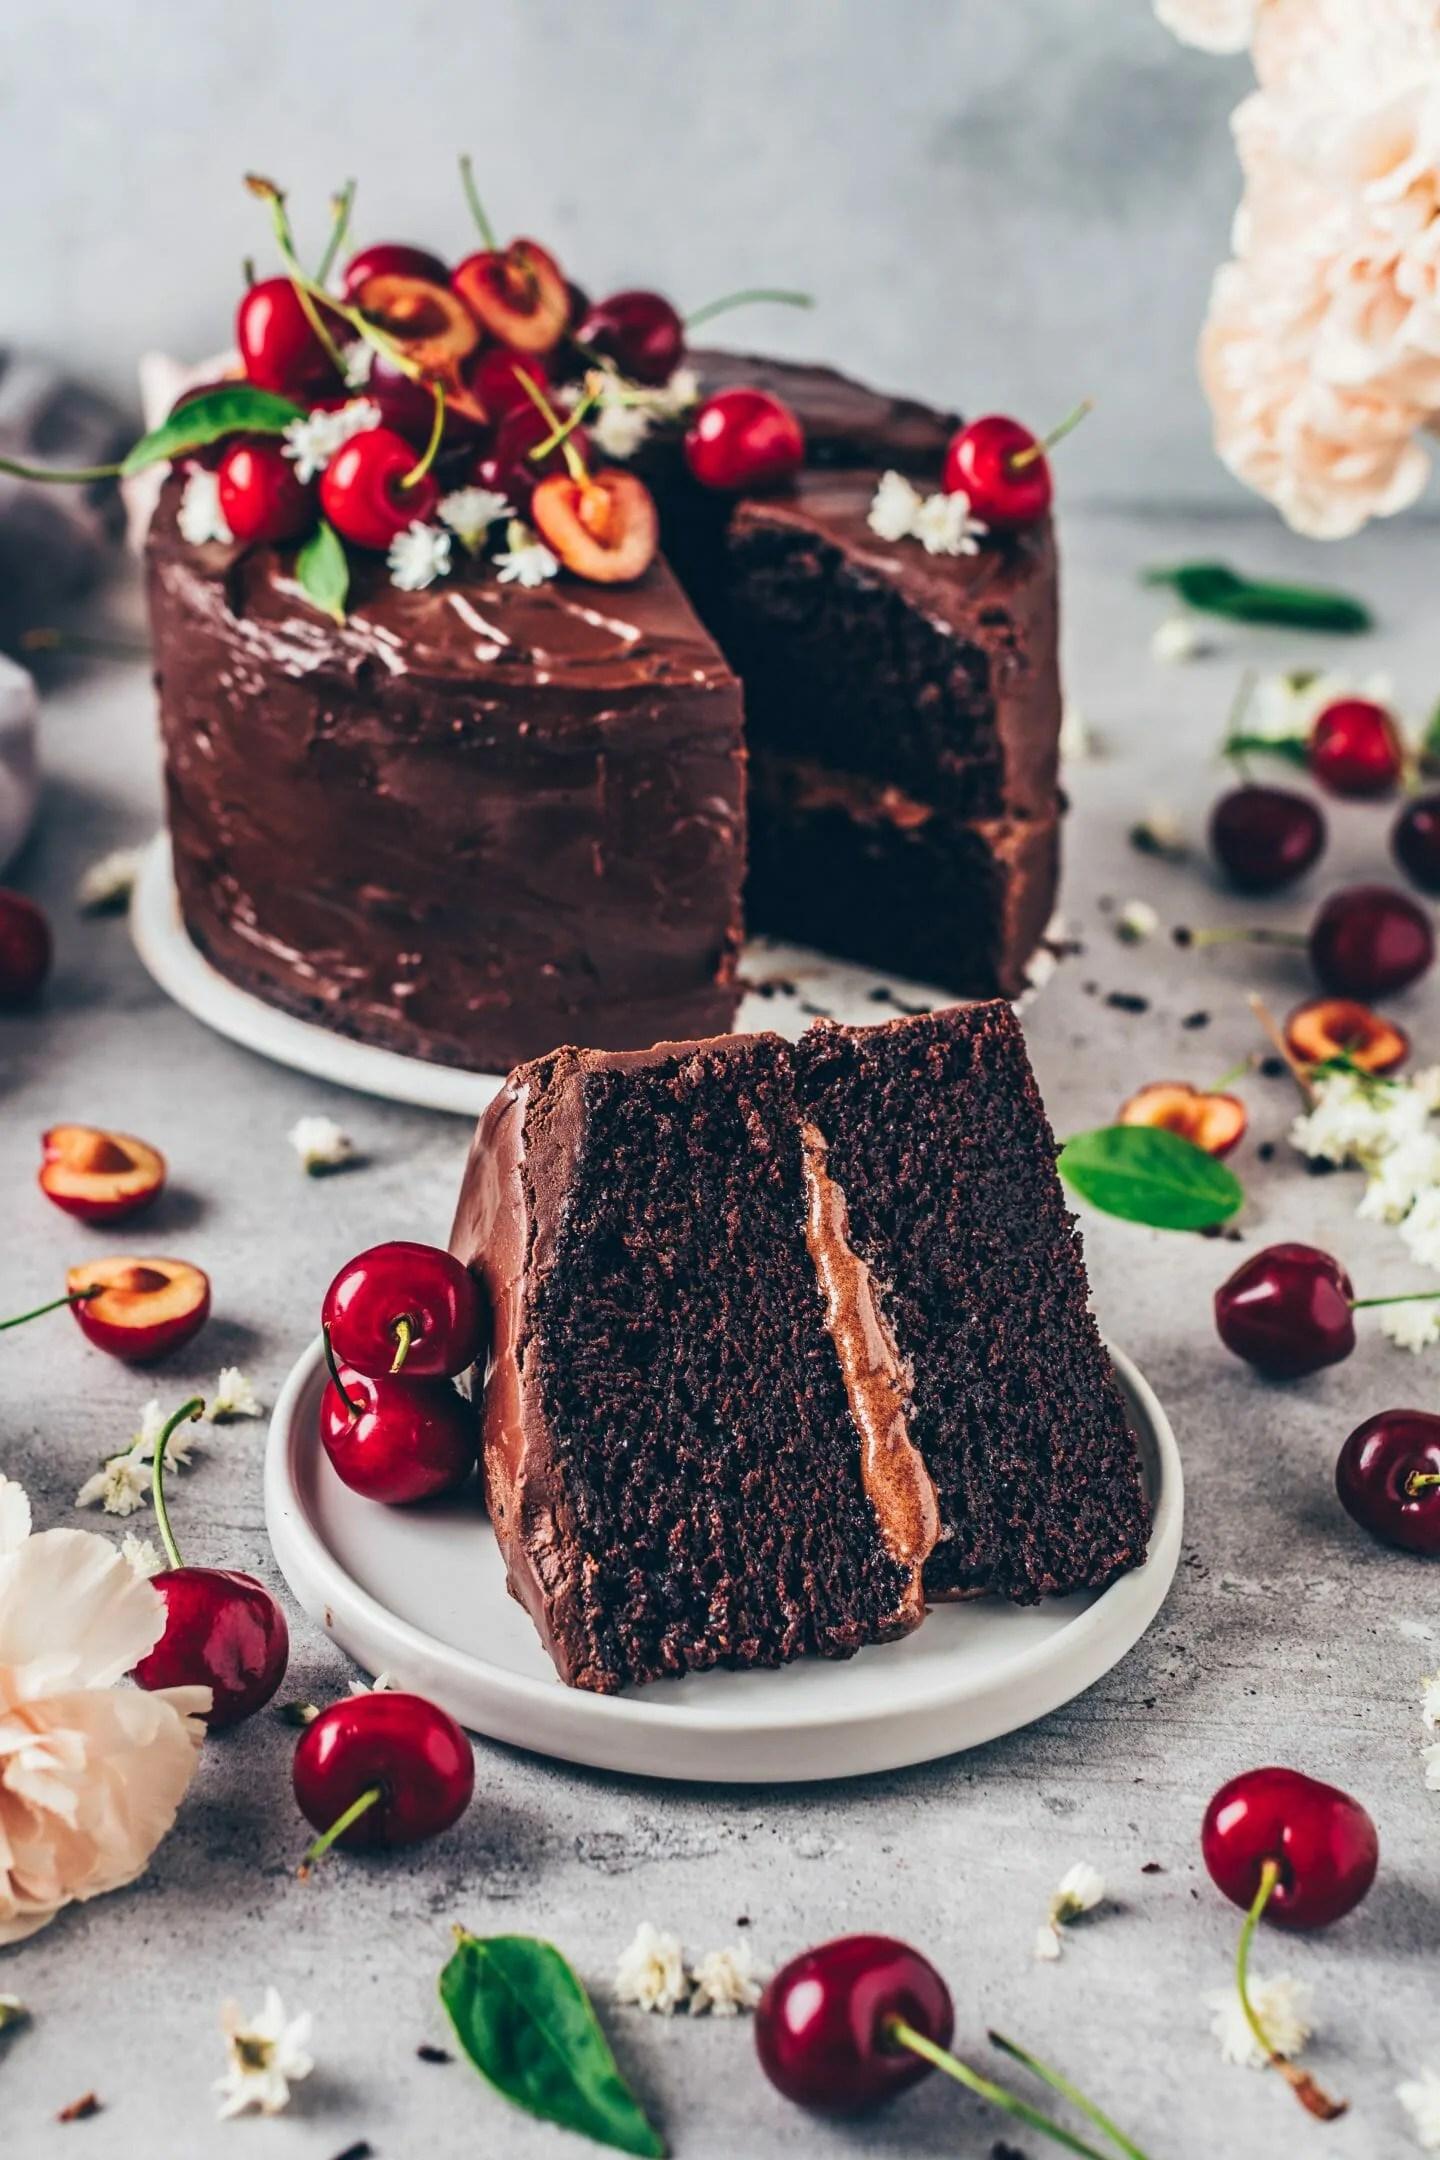 Best Vegan Chocolate Cake Easy Recipe Bianca Zapatka Recipes